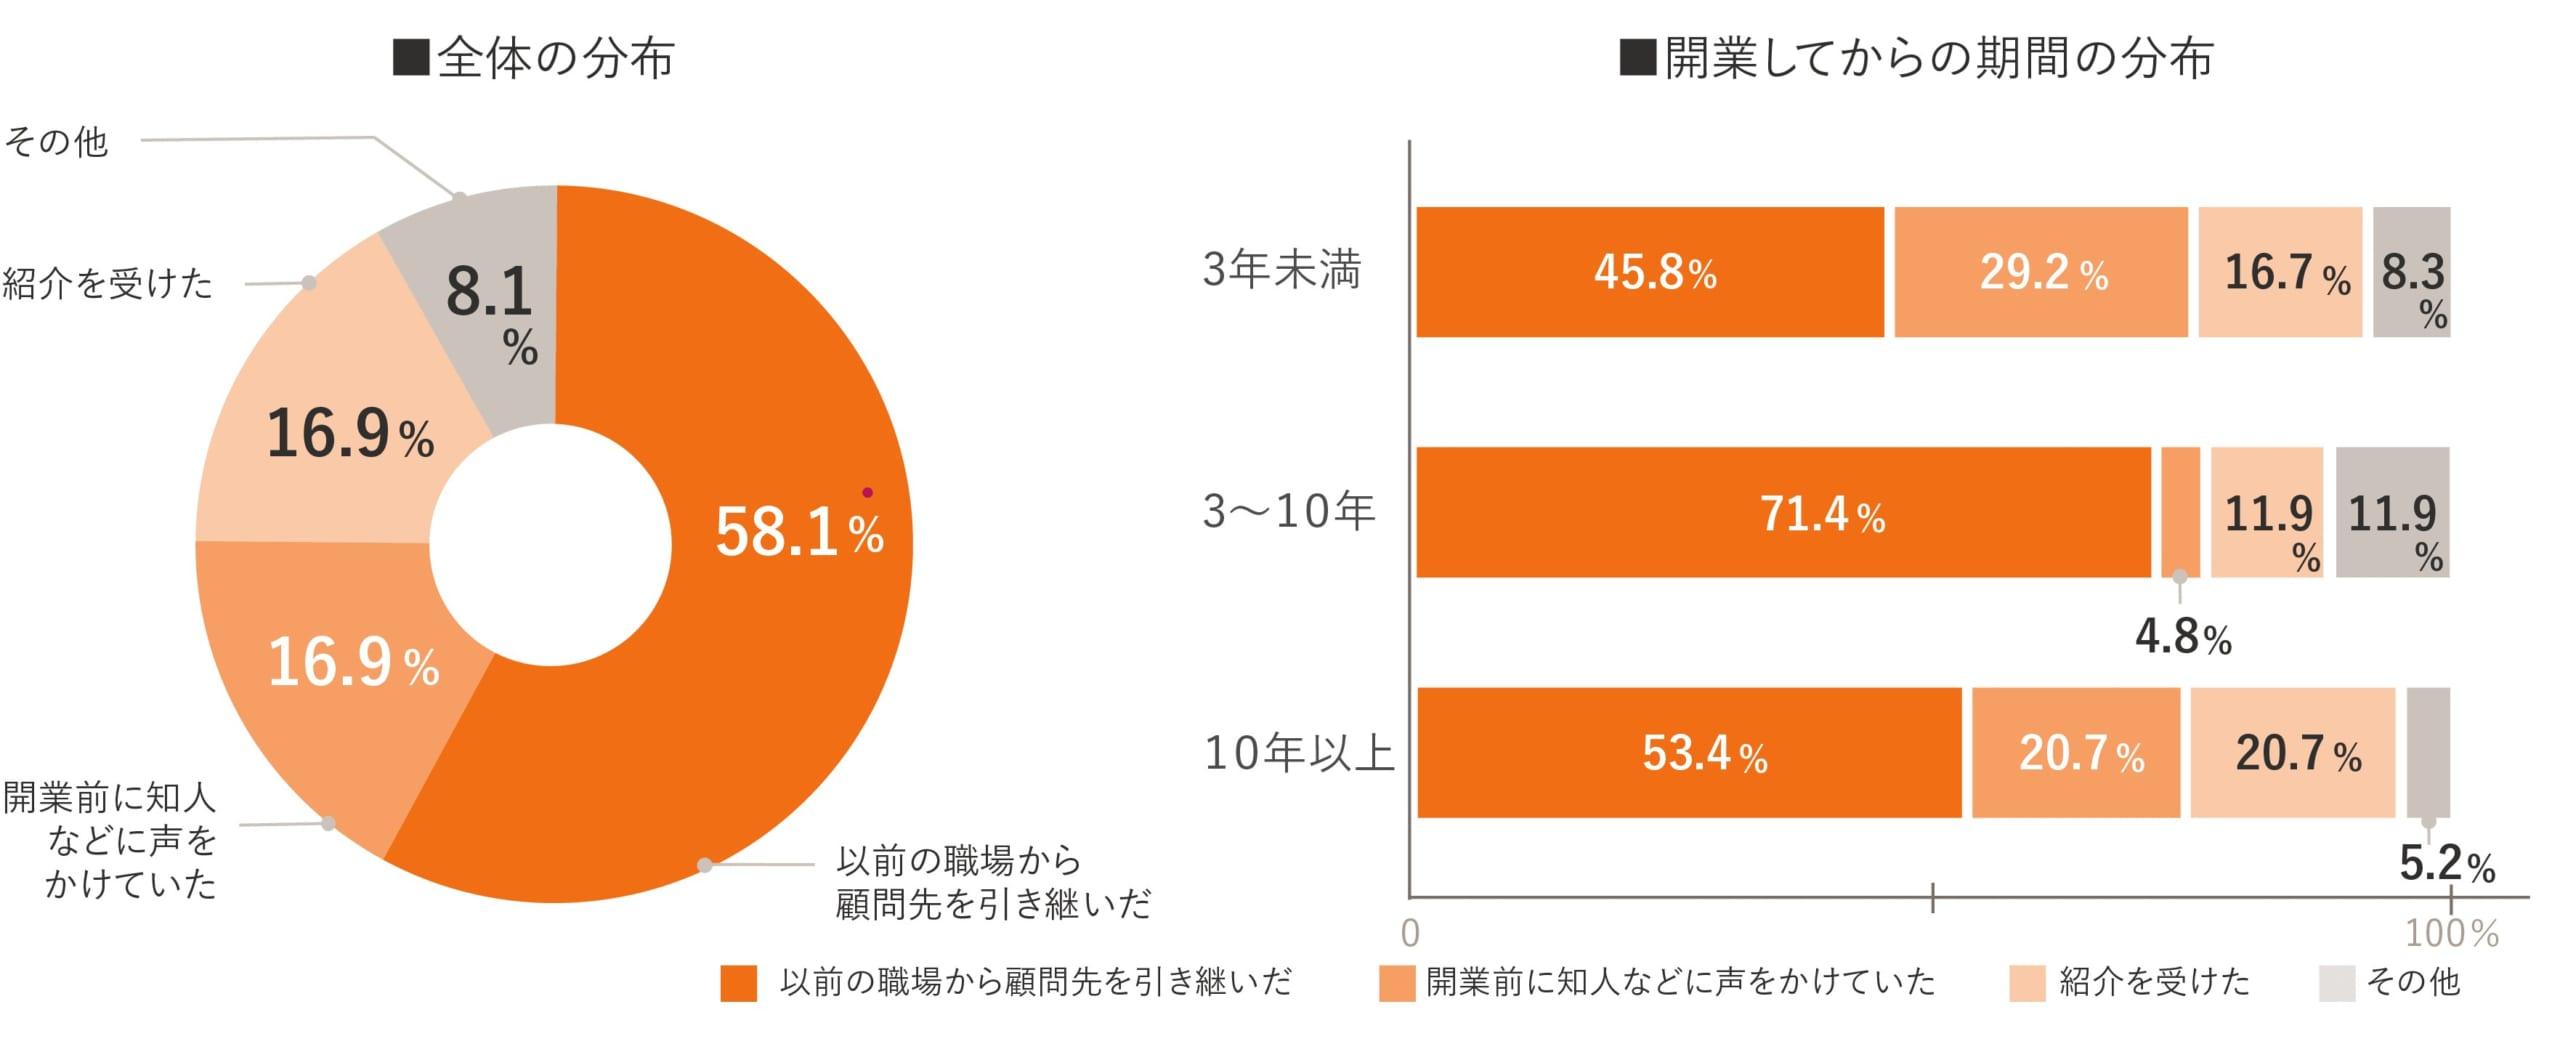 独立開業実態調査グラフ07